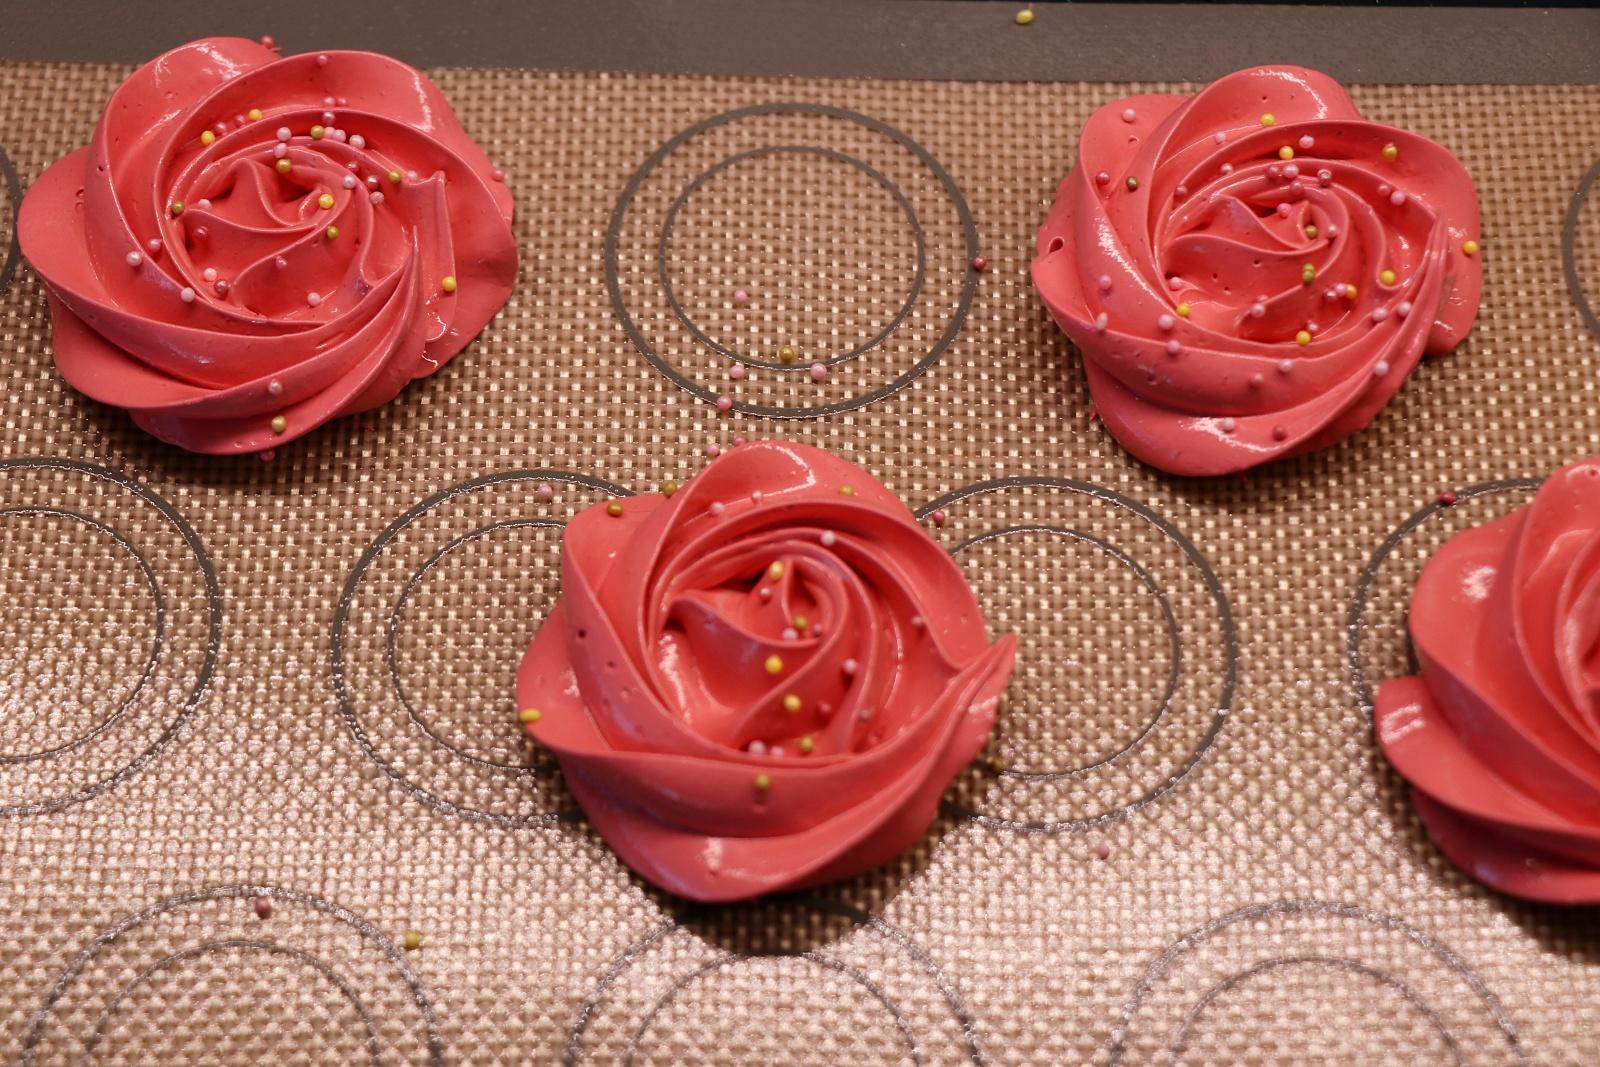 Růže s posypem